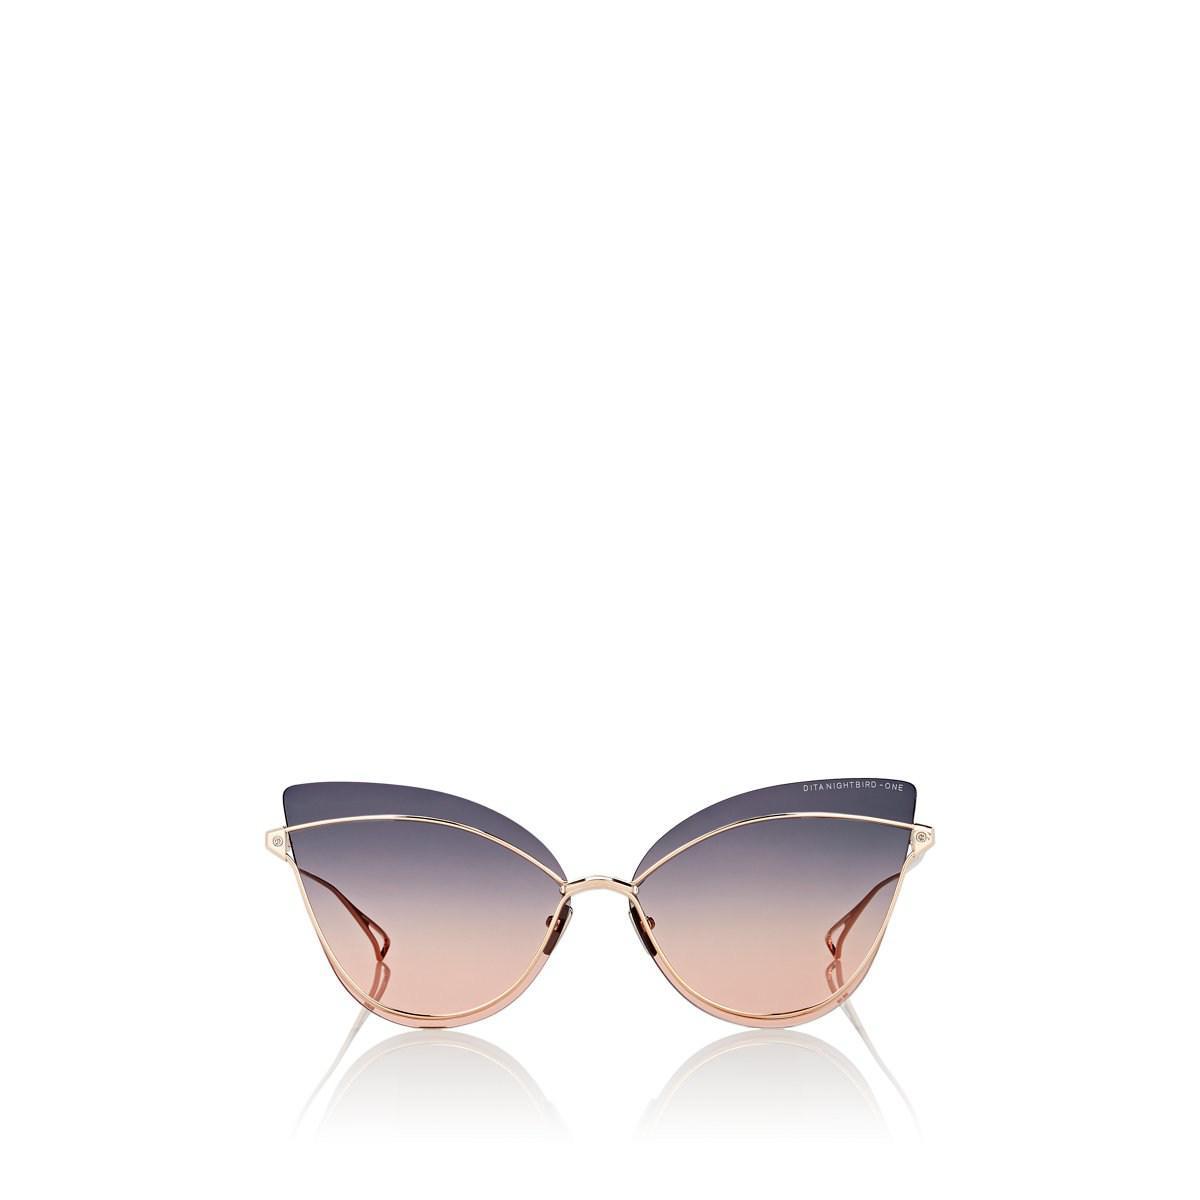 ff4fcbfc88221 Lyst - DITA Nightbird-one Sunglasses in Pink